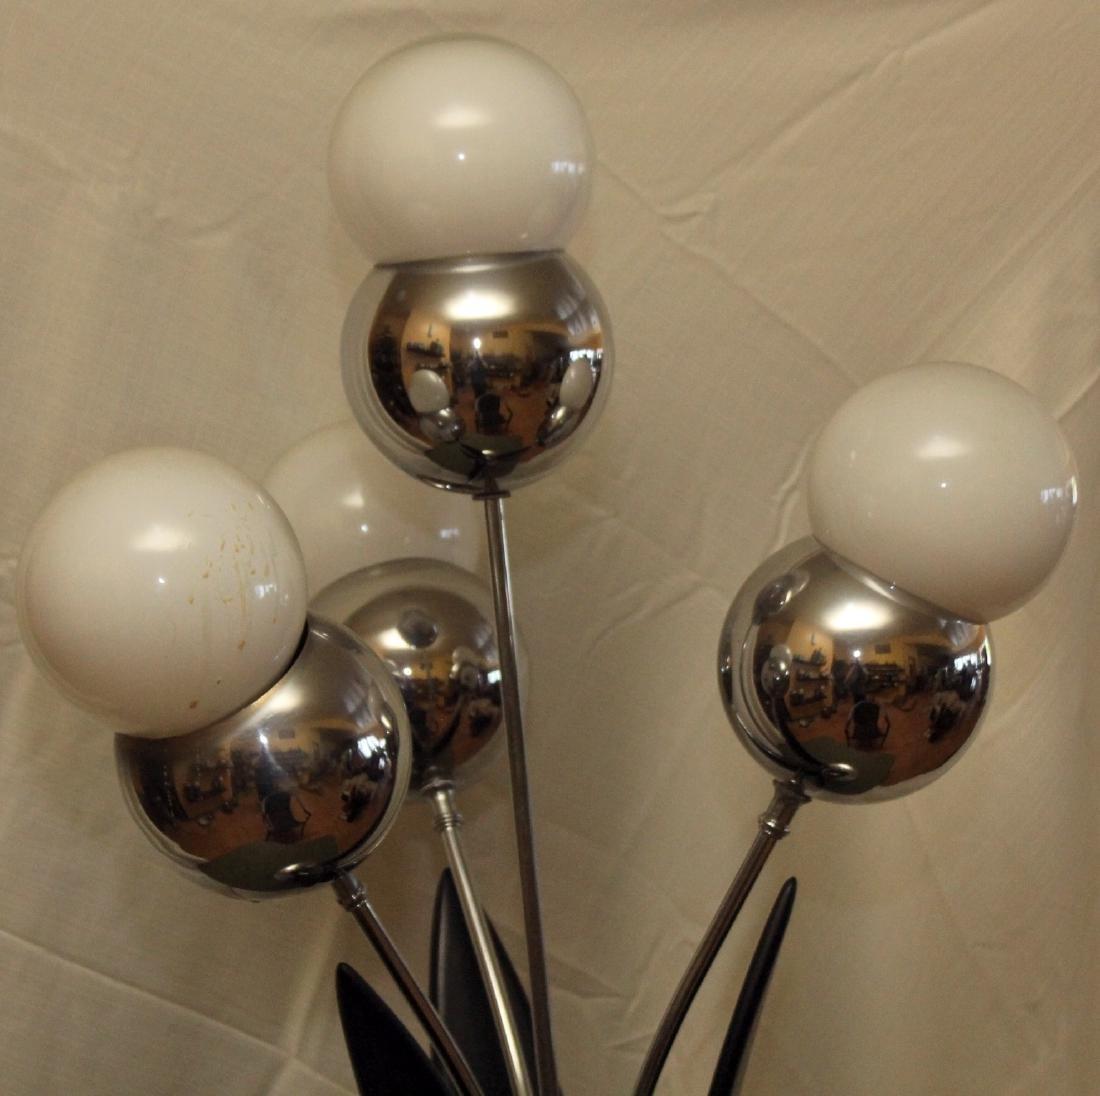 4 bulb mid century modern table lamp, wood and chrome - 2